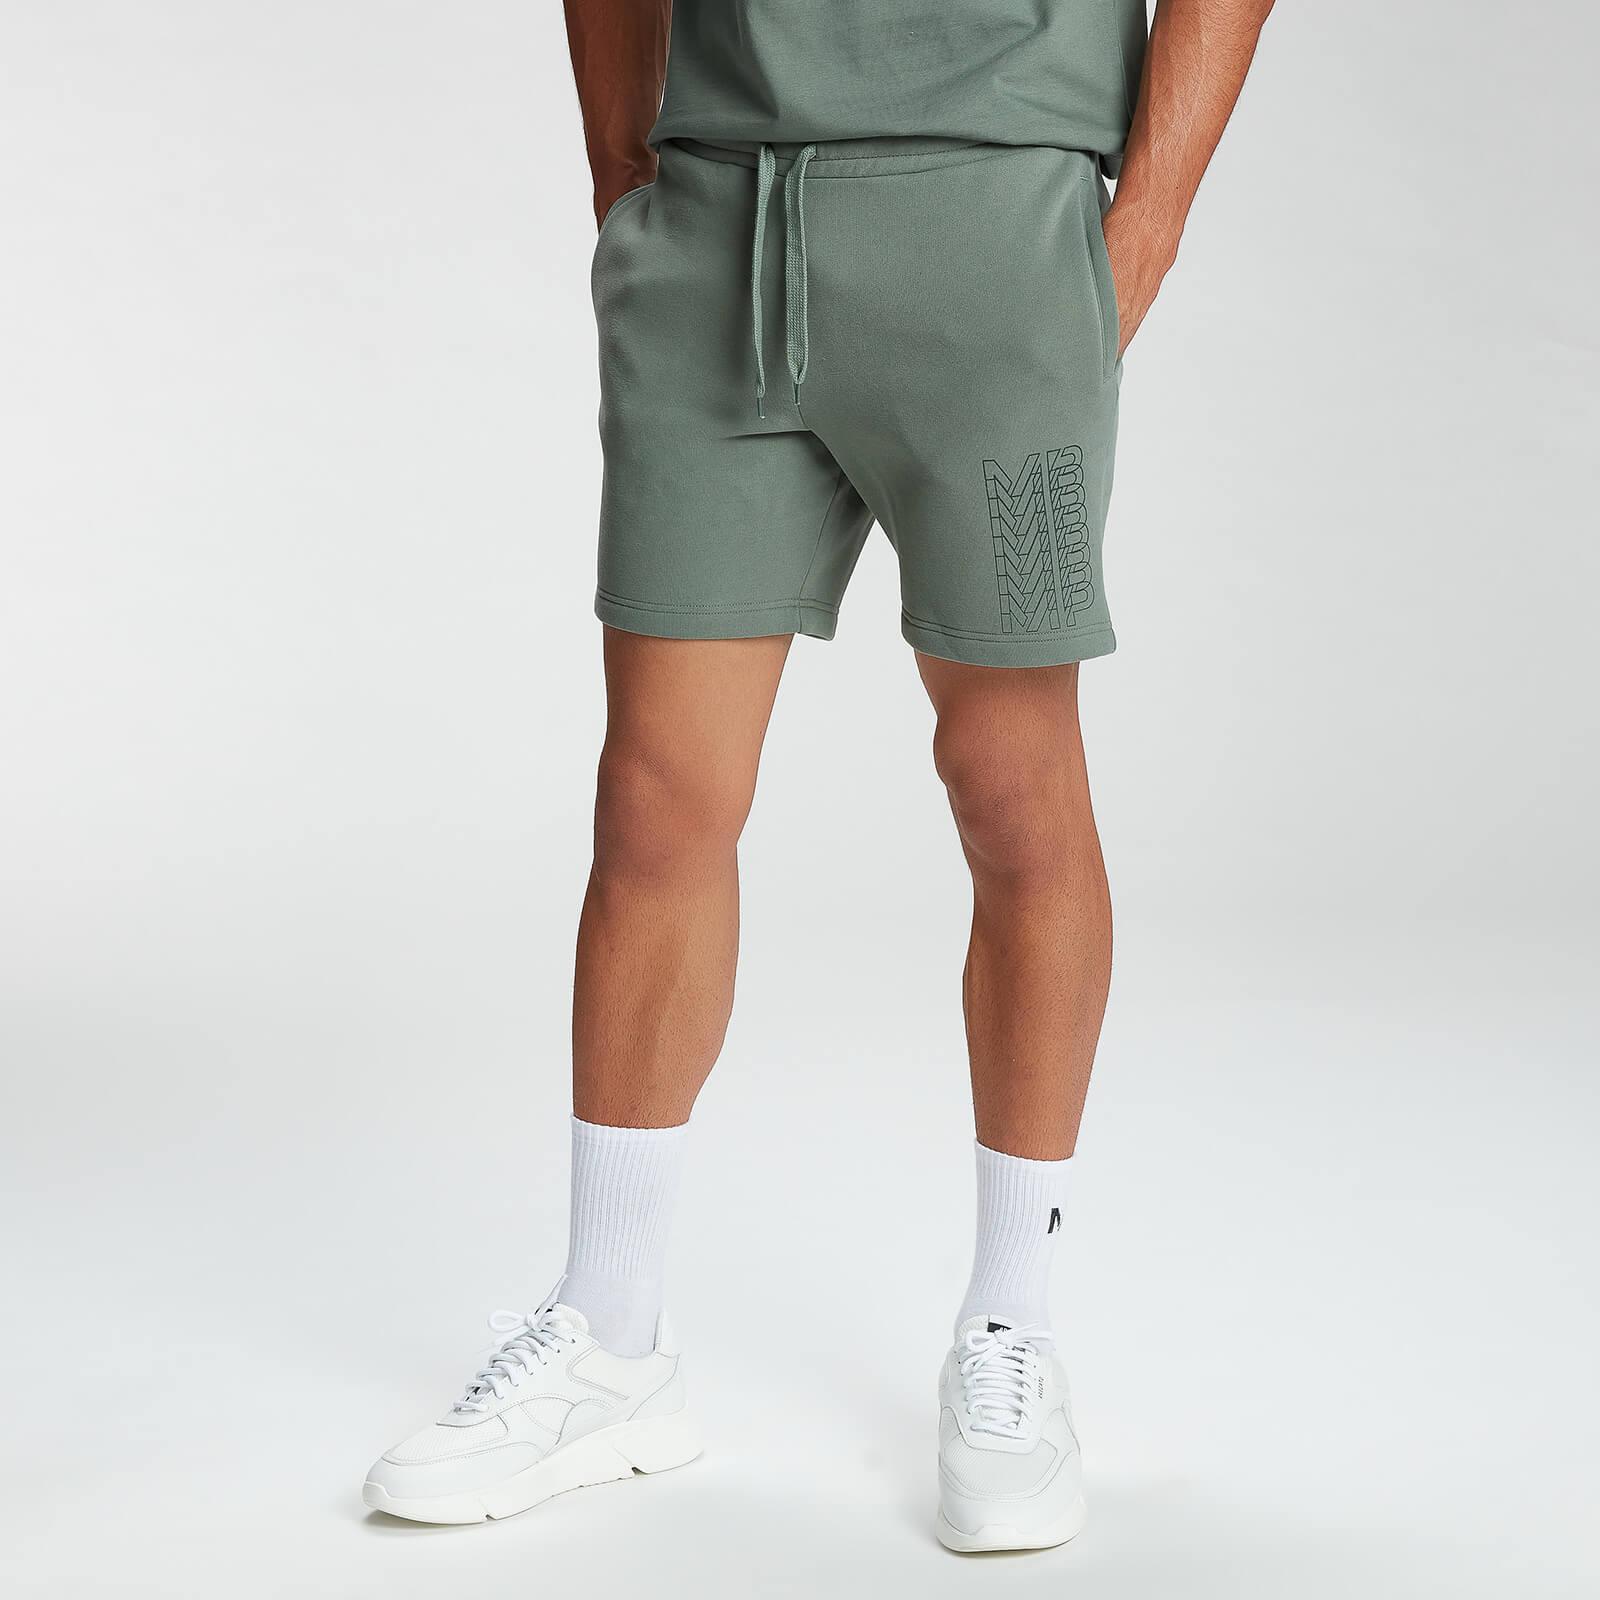 Купить MP Men's Repeat MP Graphic Shorts - Cactus - XL, Myprotein International